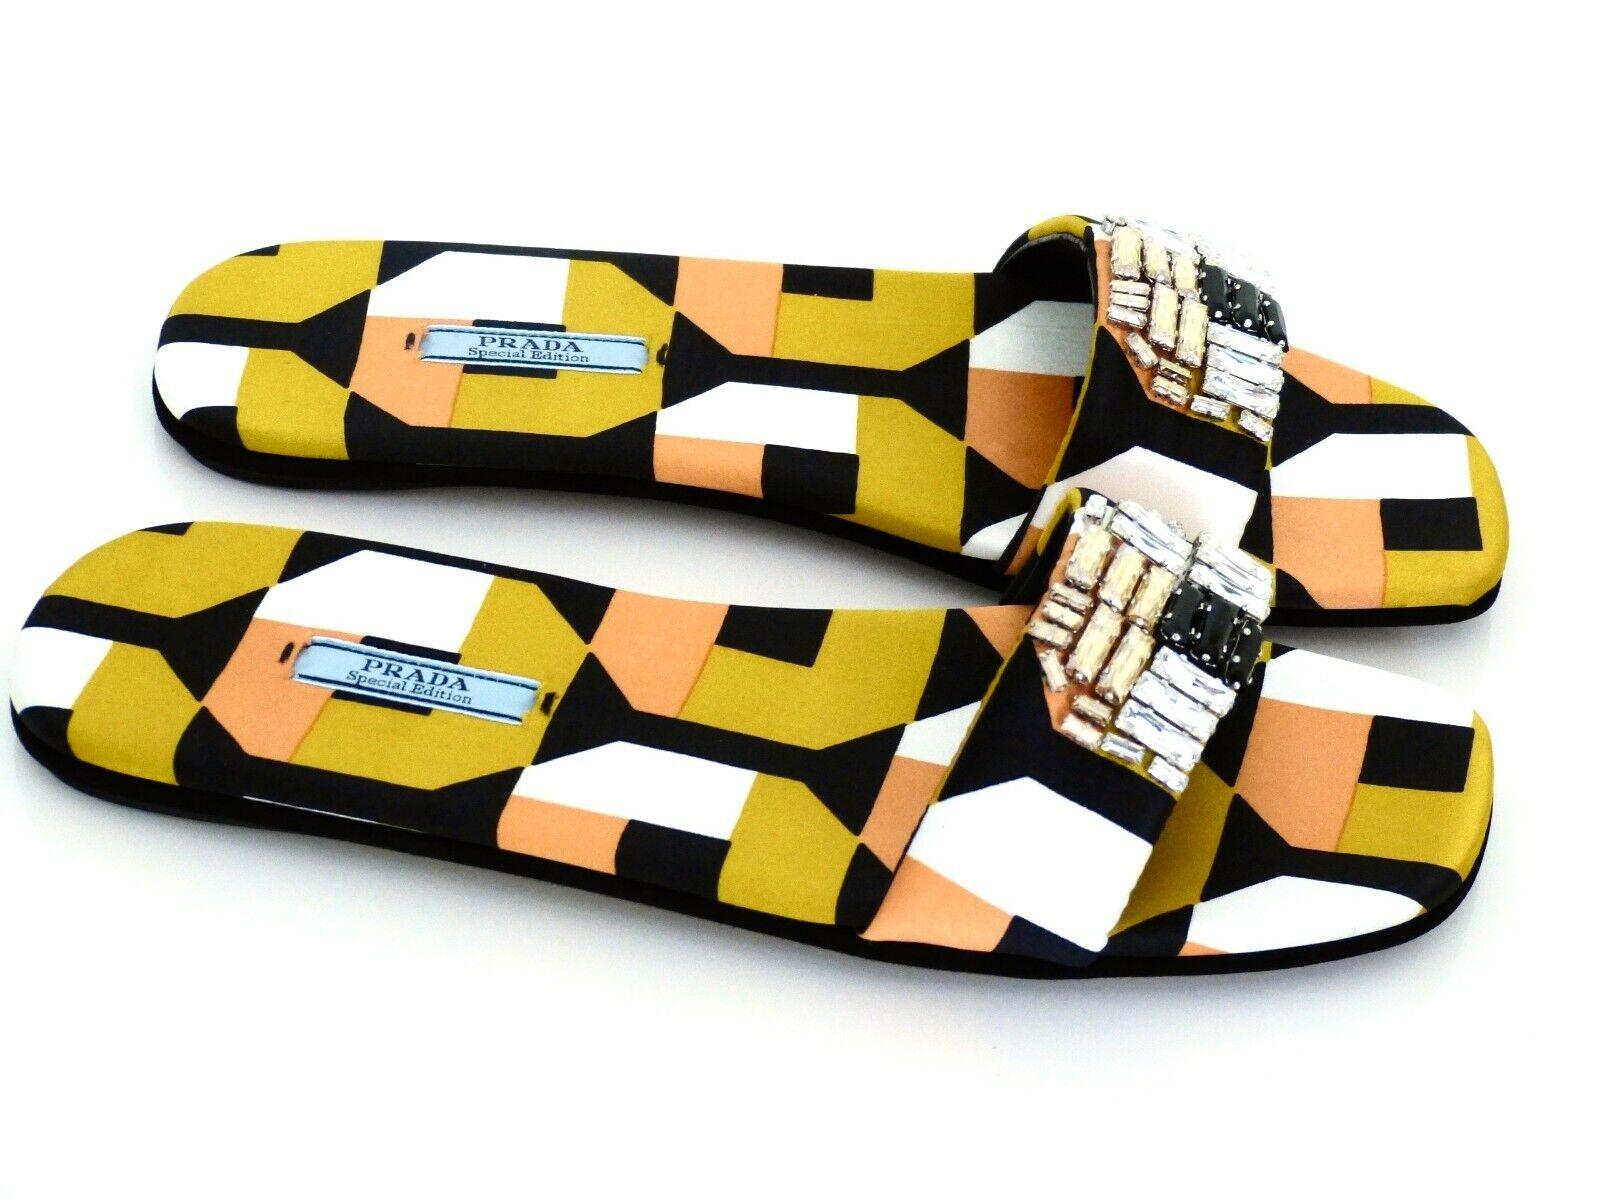 Prada señora sandalias zapatos Flats Crystal Stone Limited Edition eu 39, 5neu new